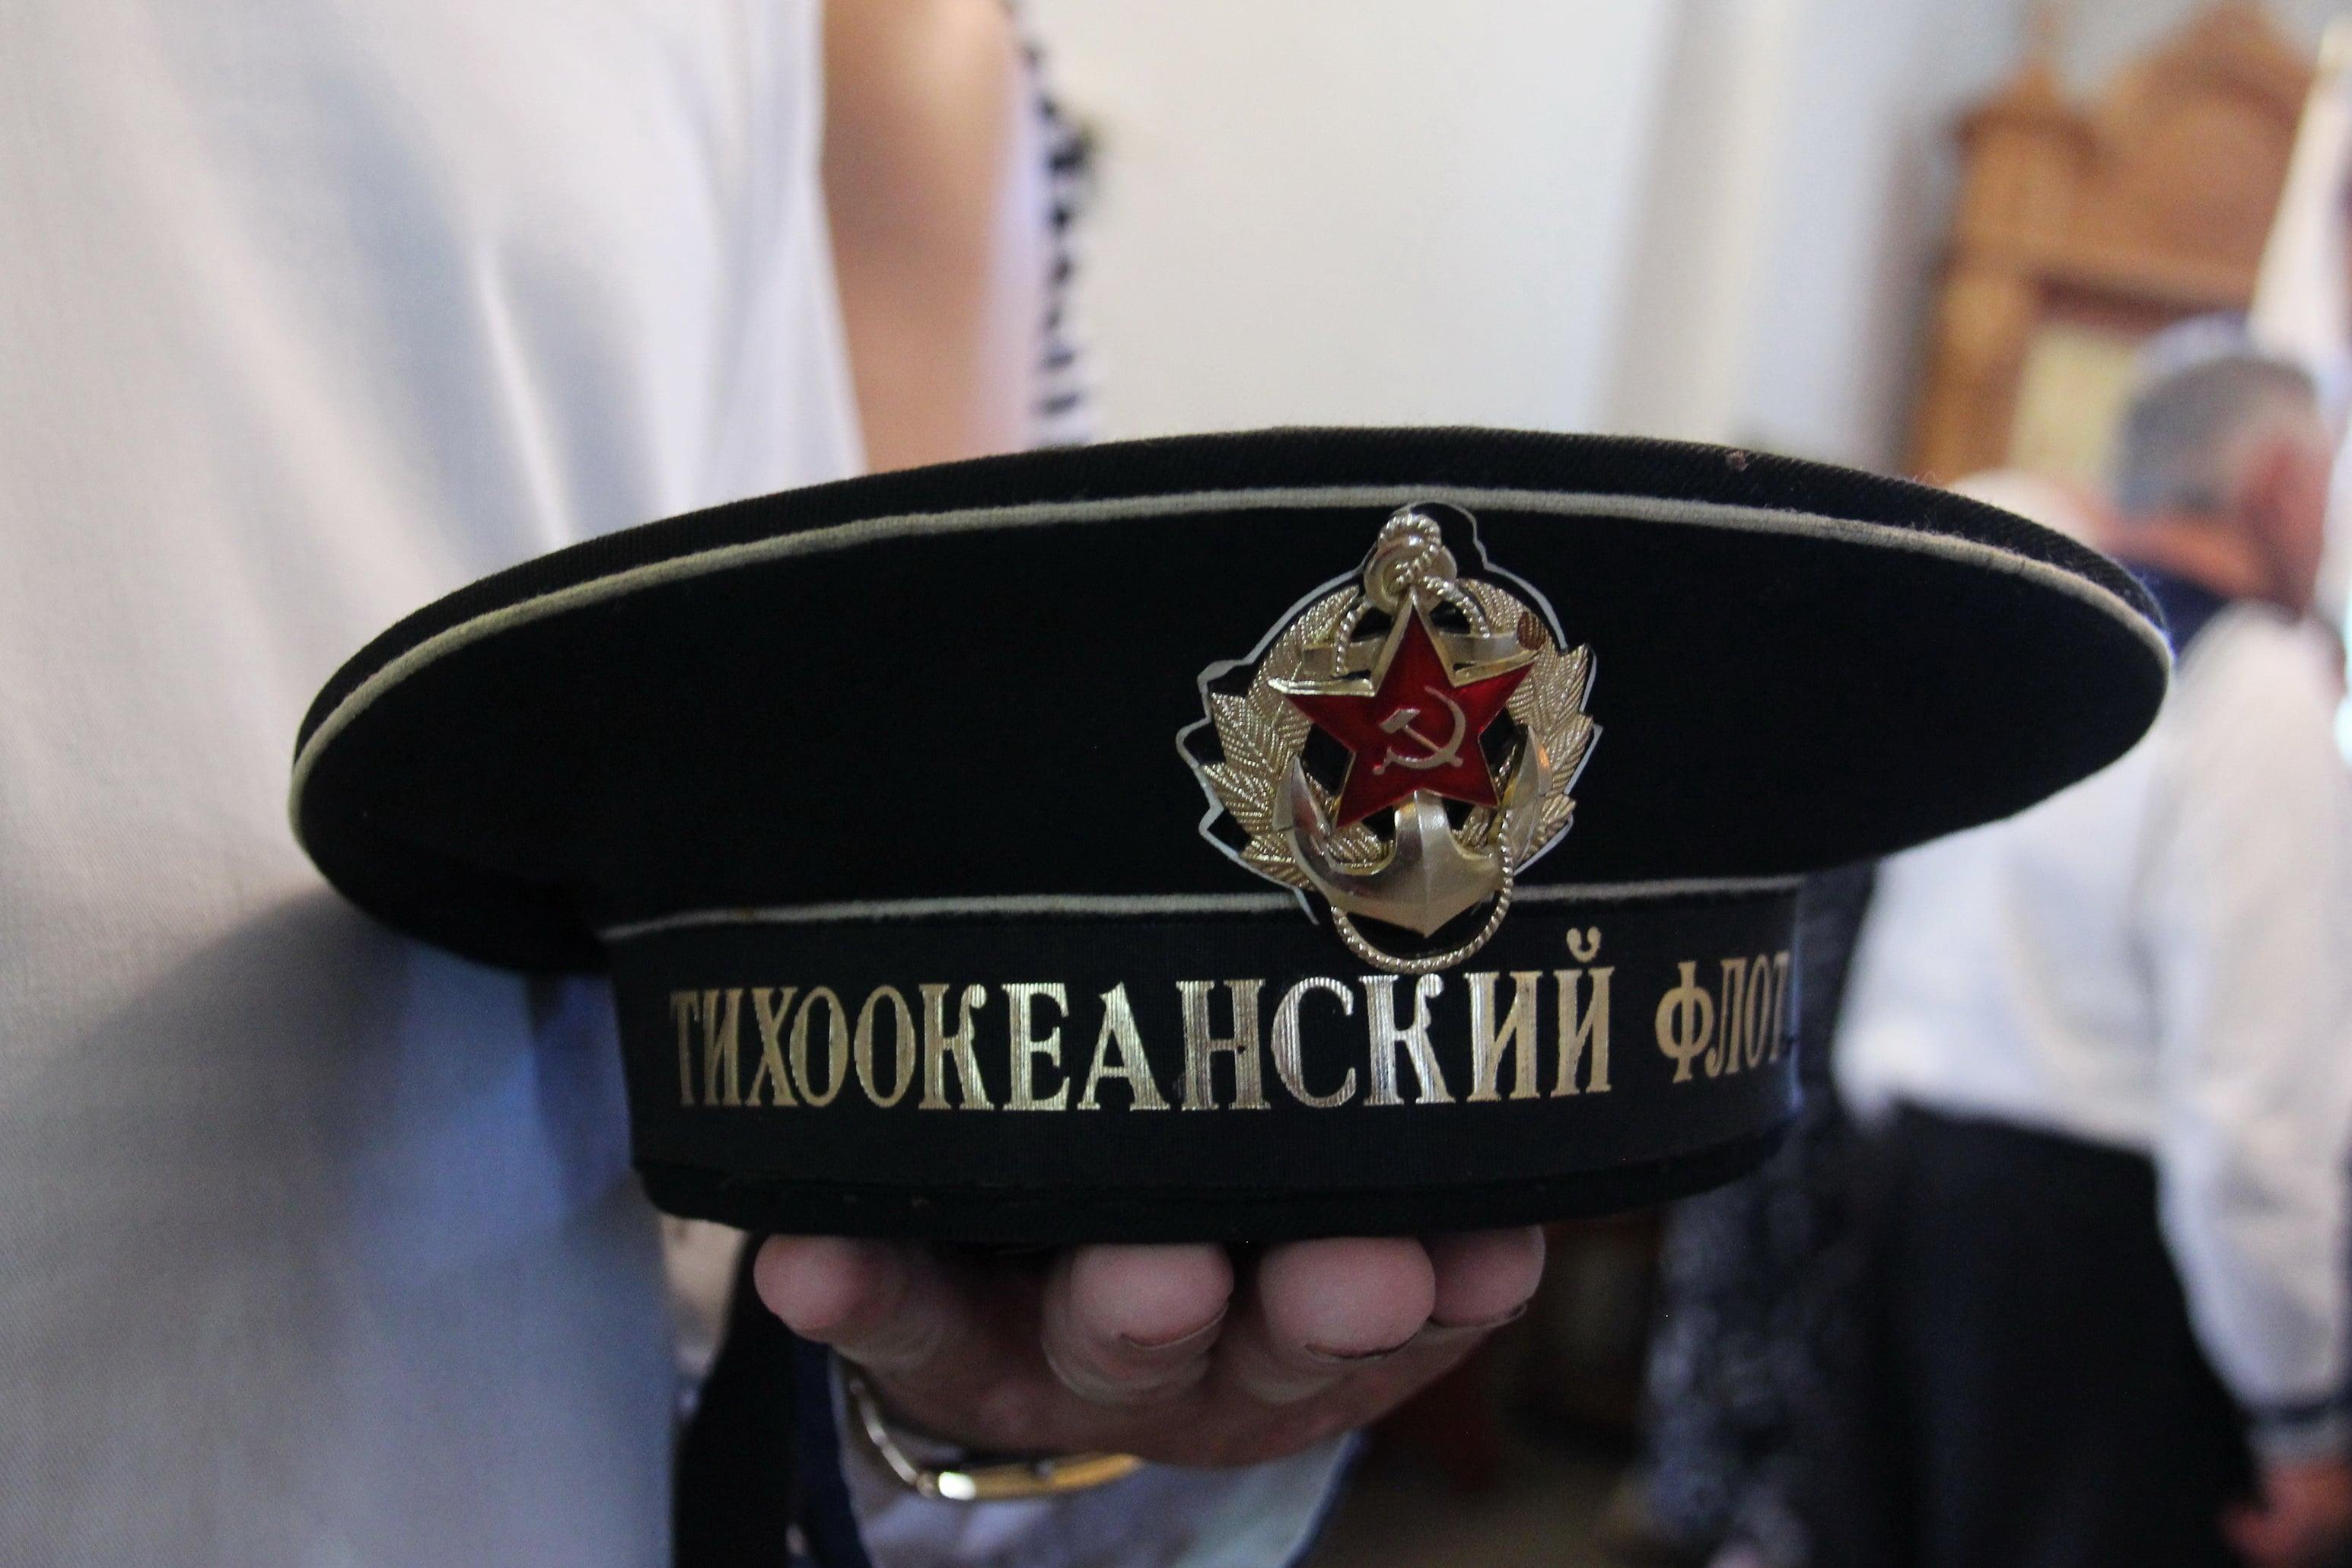 http://monuspen.ru/photoreports/0d5ed0fcdc169b02e08cdc58ab7fd10s.JPG